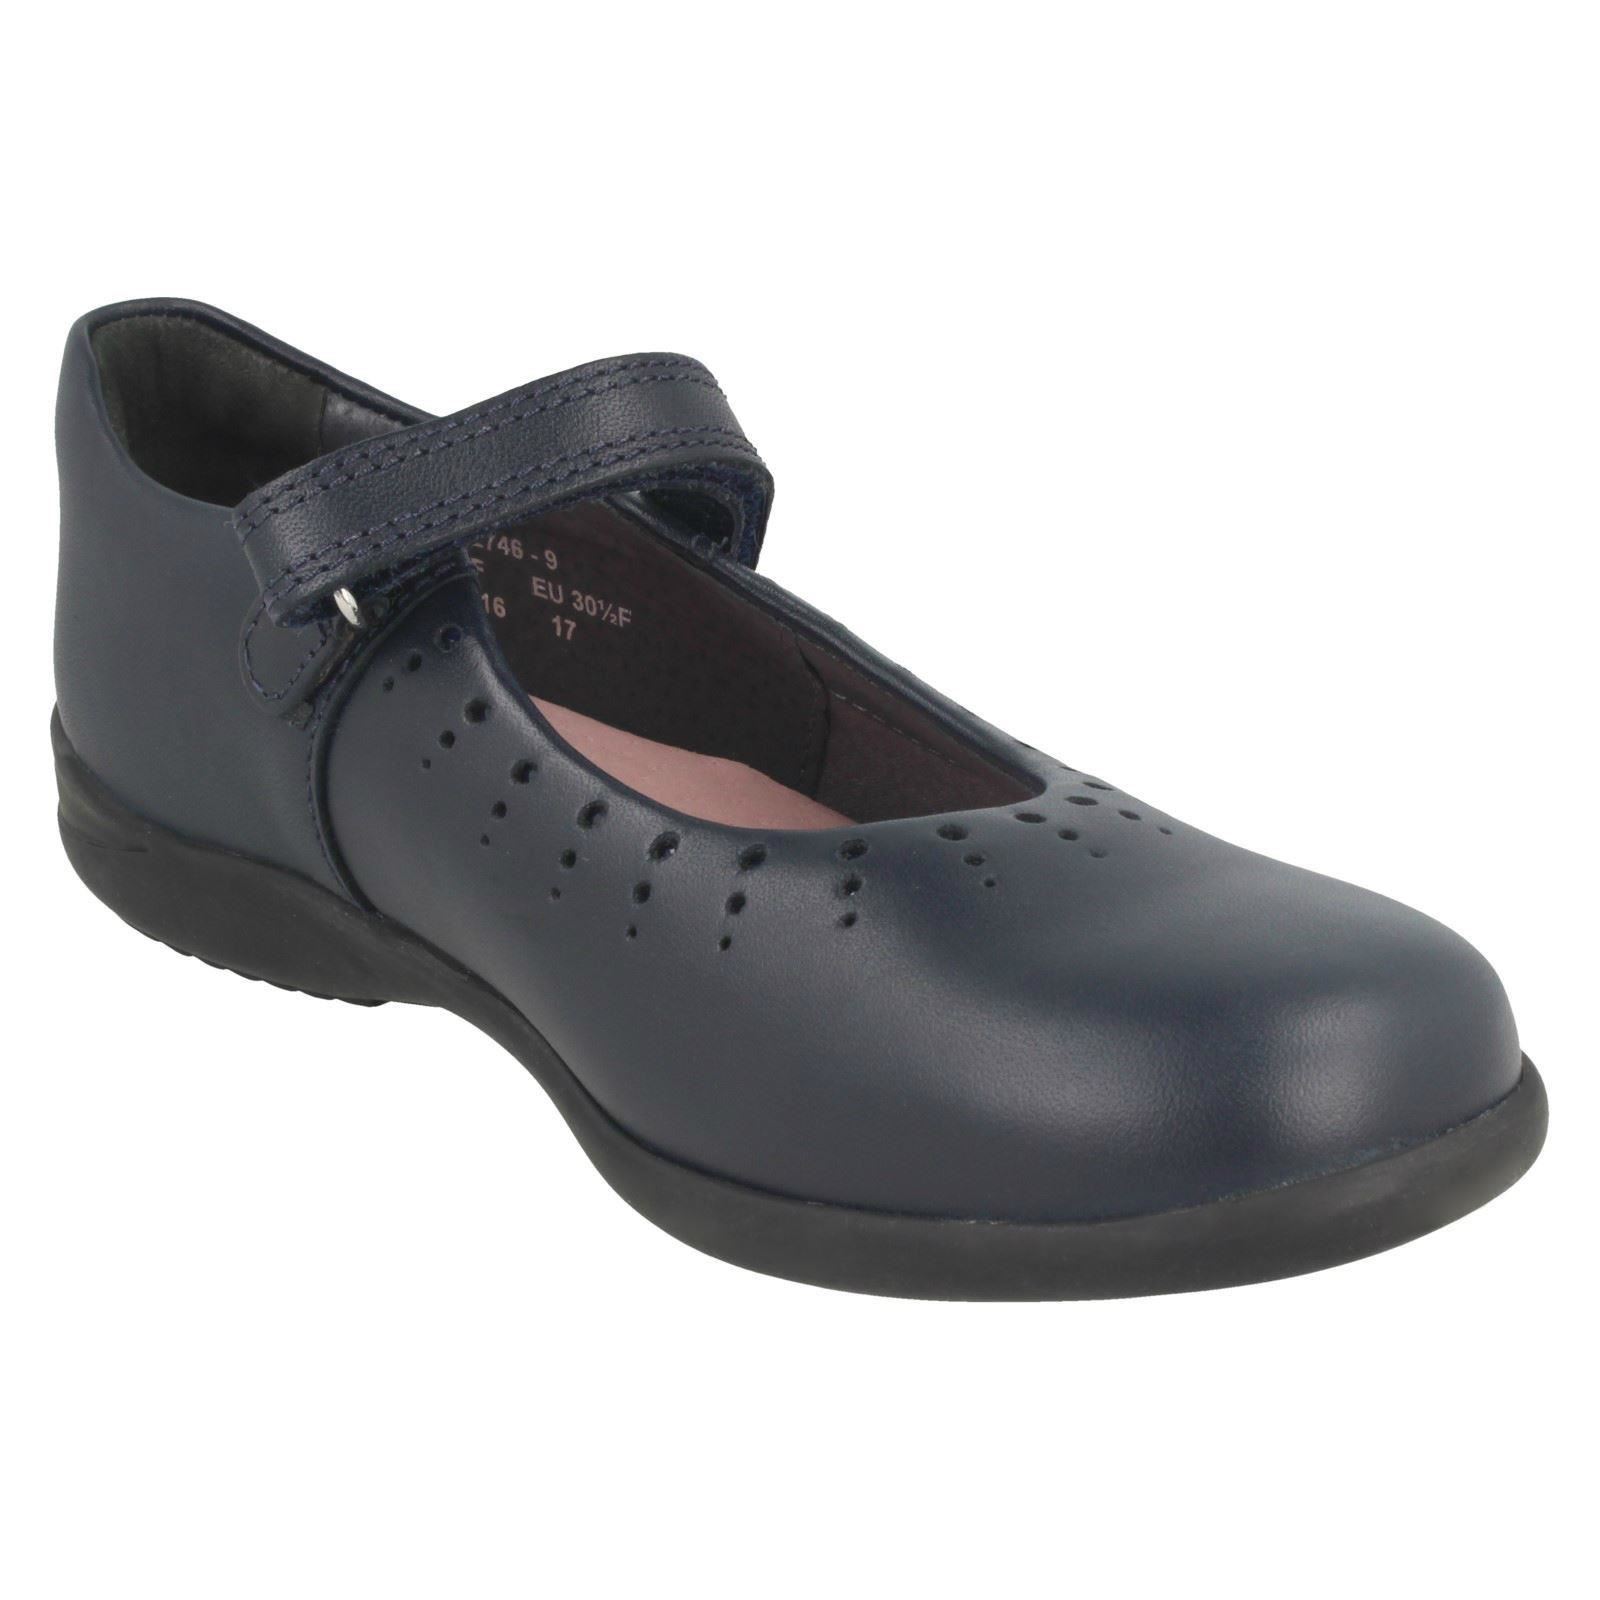 Girls Startrite School Shoes Formal Mary Jane